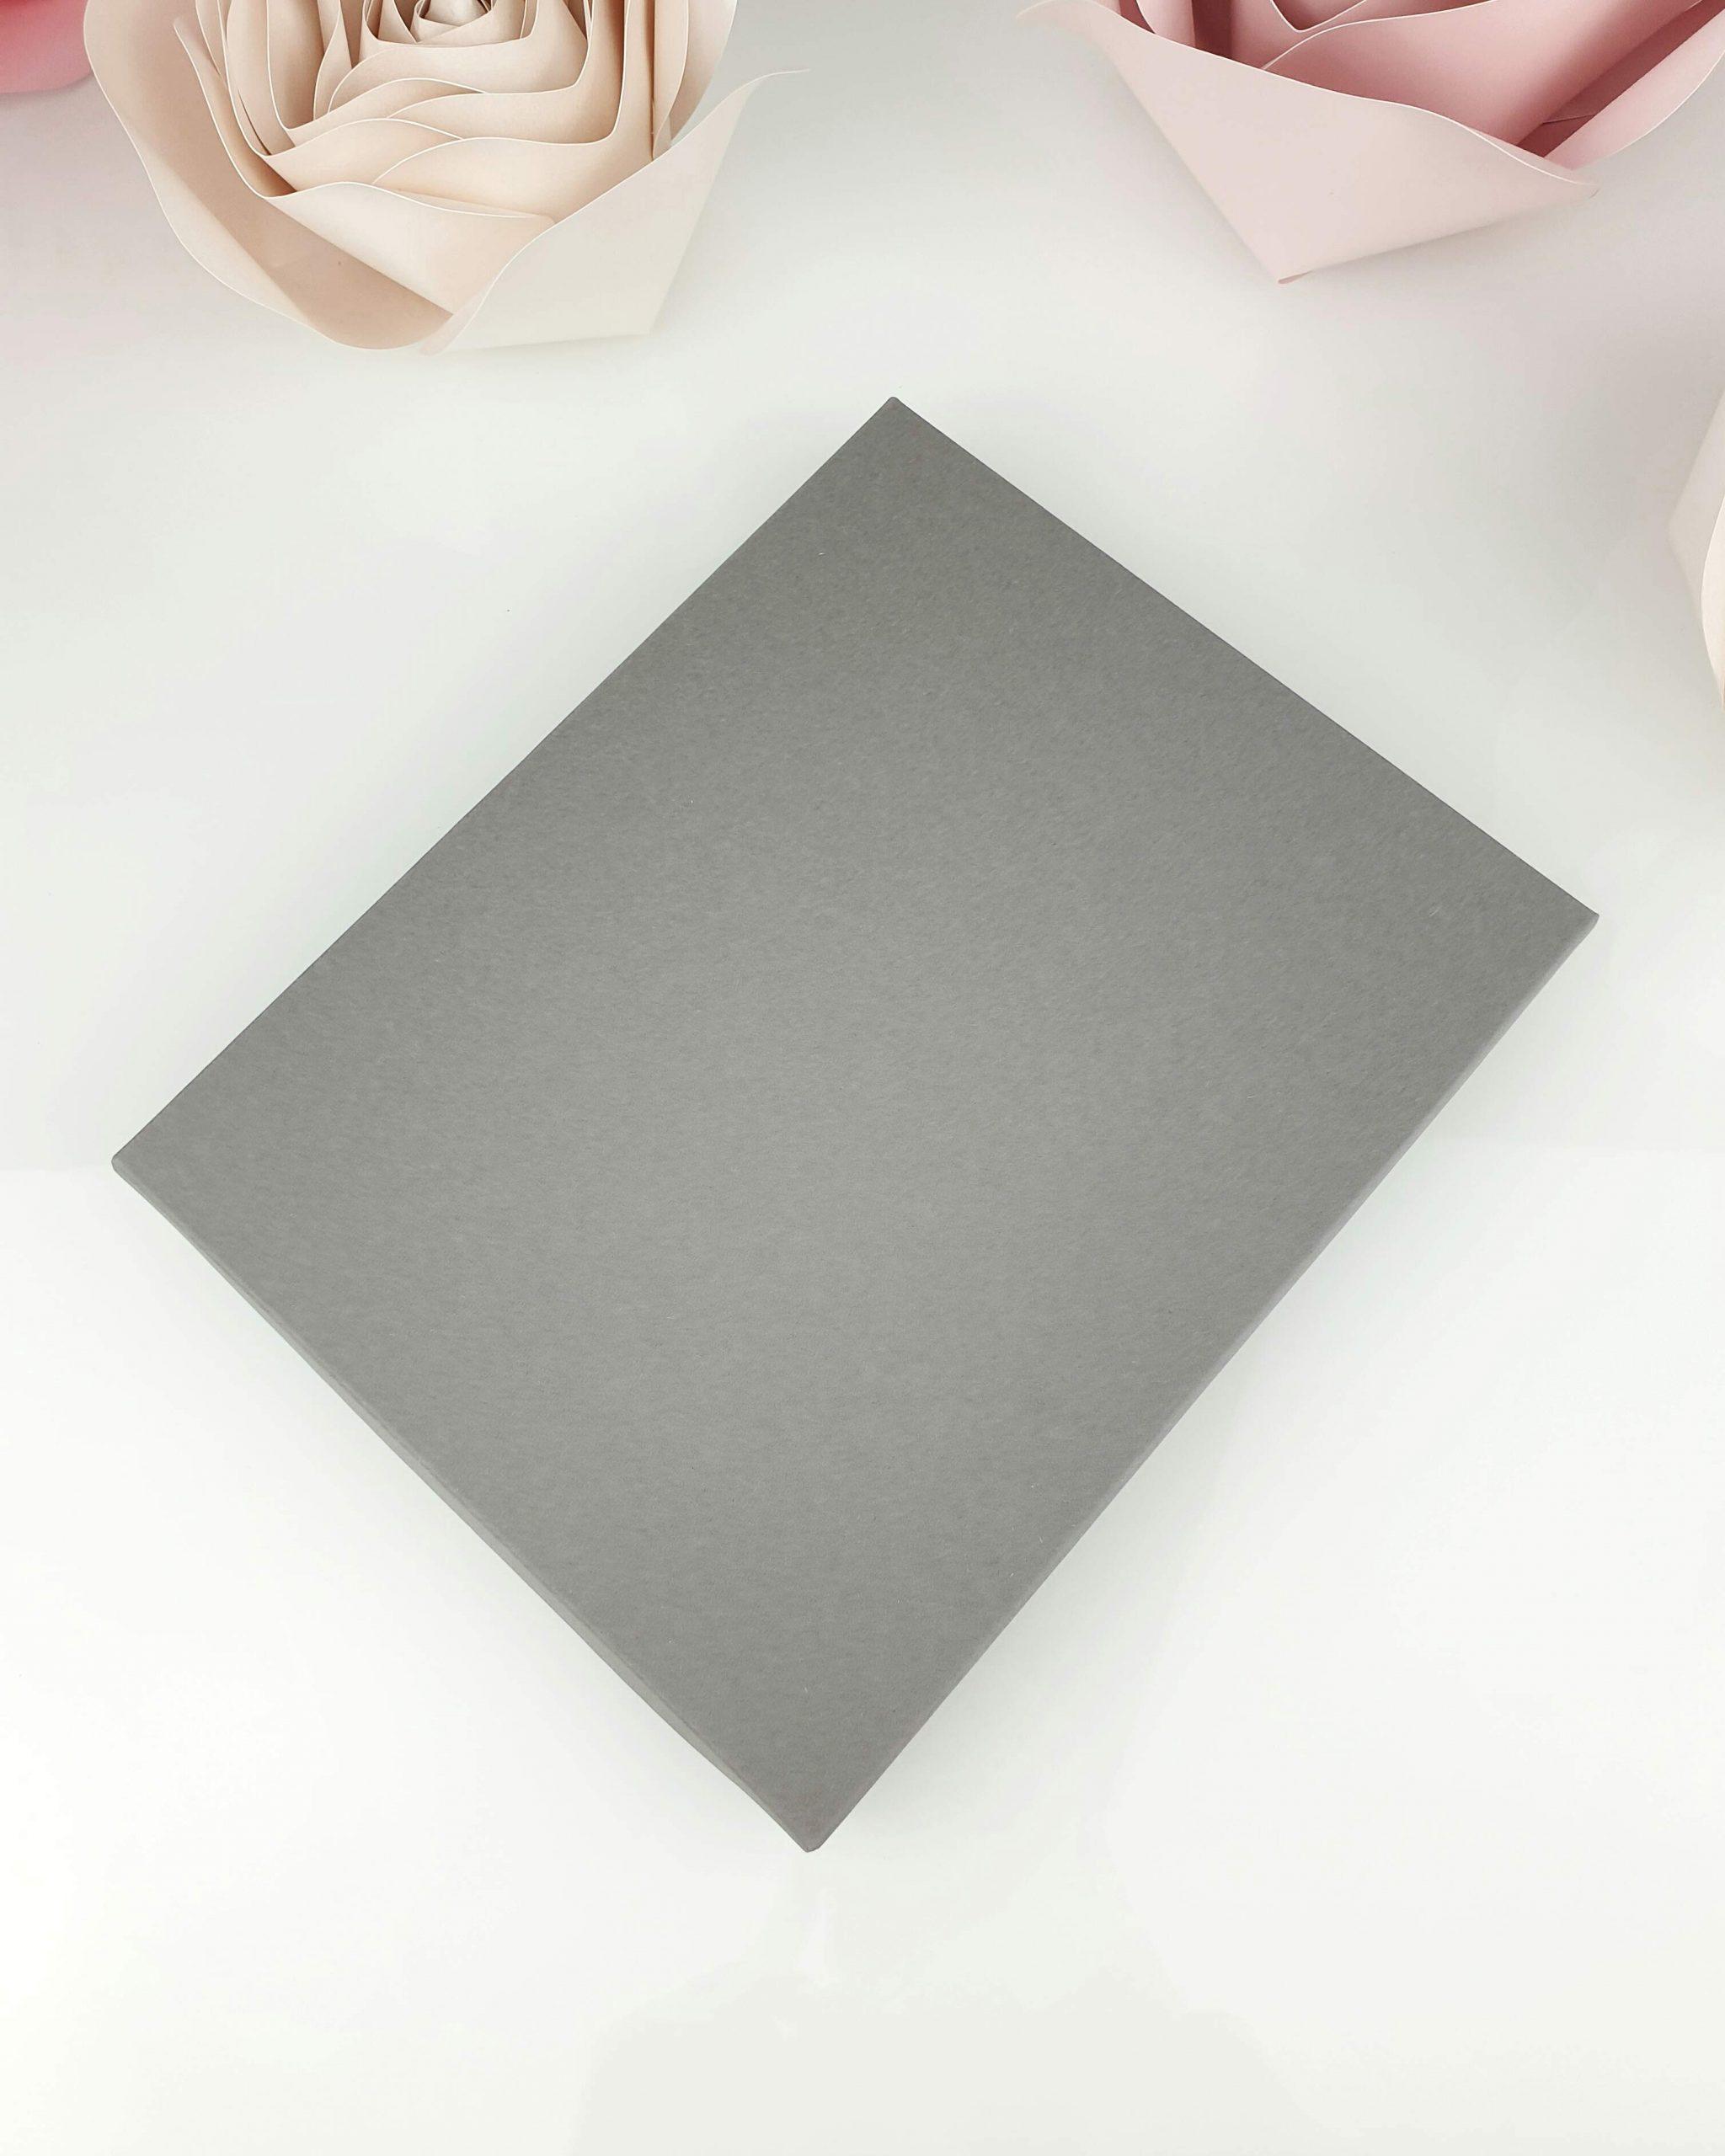 Etui szare z wkładką stabilizującą do tafli A5 dodatki